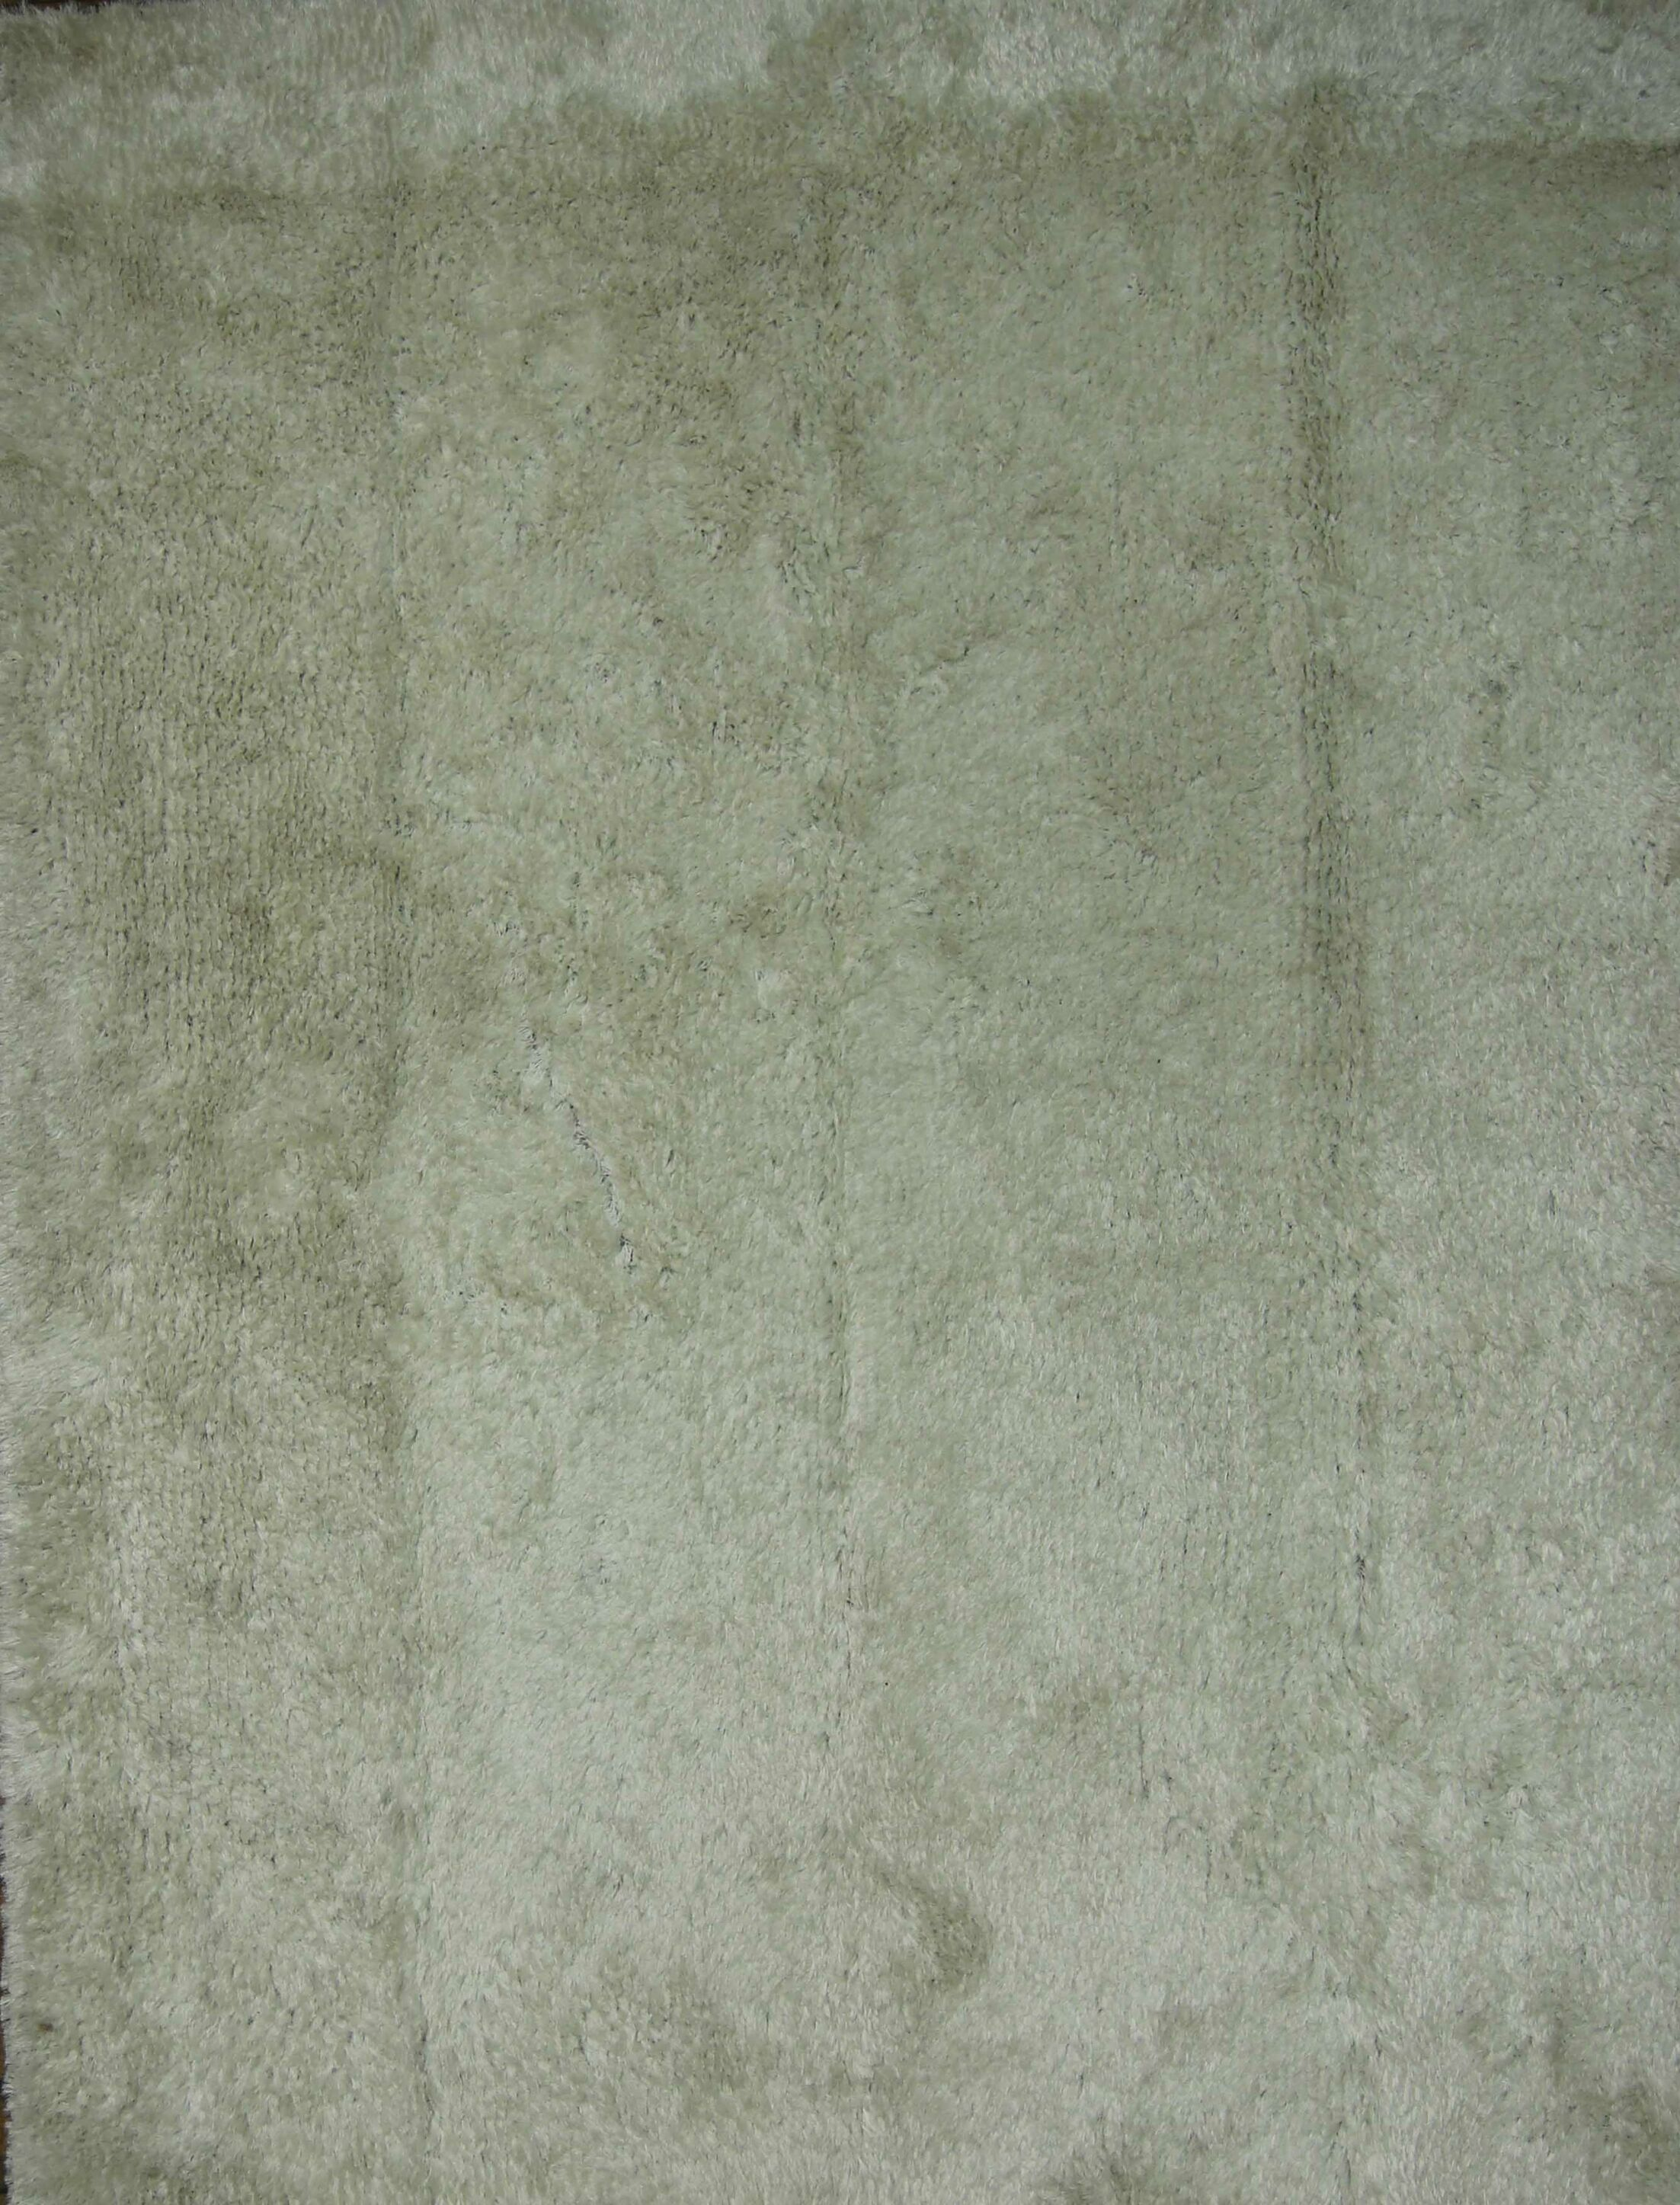 Kirchner Shaggy Oriental Hand-Tufted Gray Area Rug